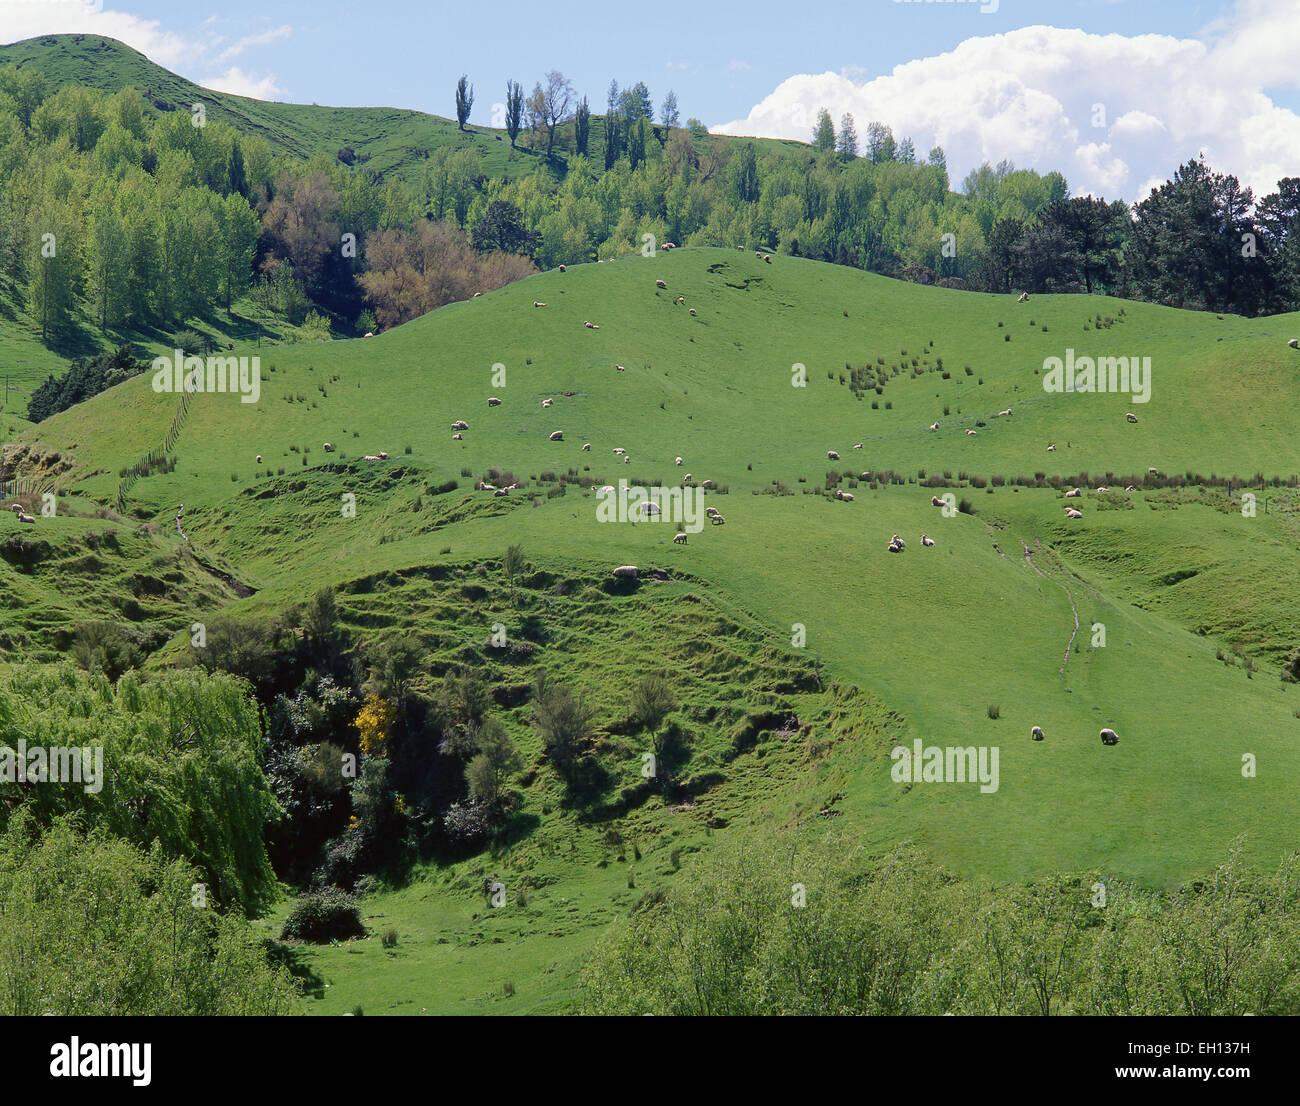 Sheep on hillside, Rotorua District, Bay of Plenty Region, North Island, New Zealand - Stock Image